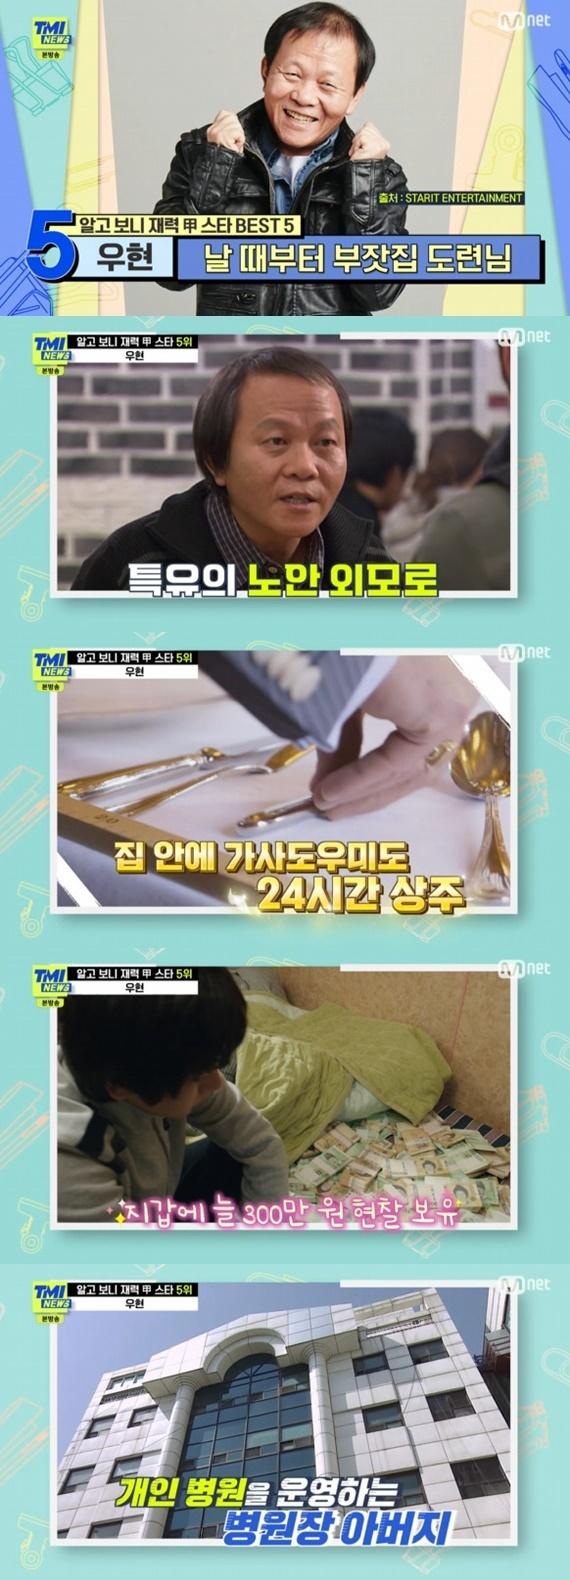 Mnet 'TMI NEWS' © 뉴스1